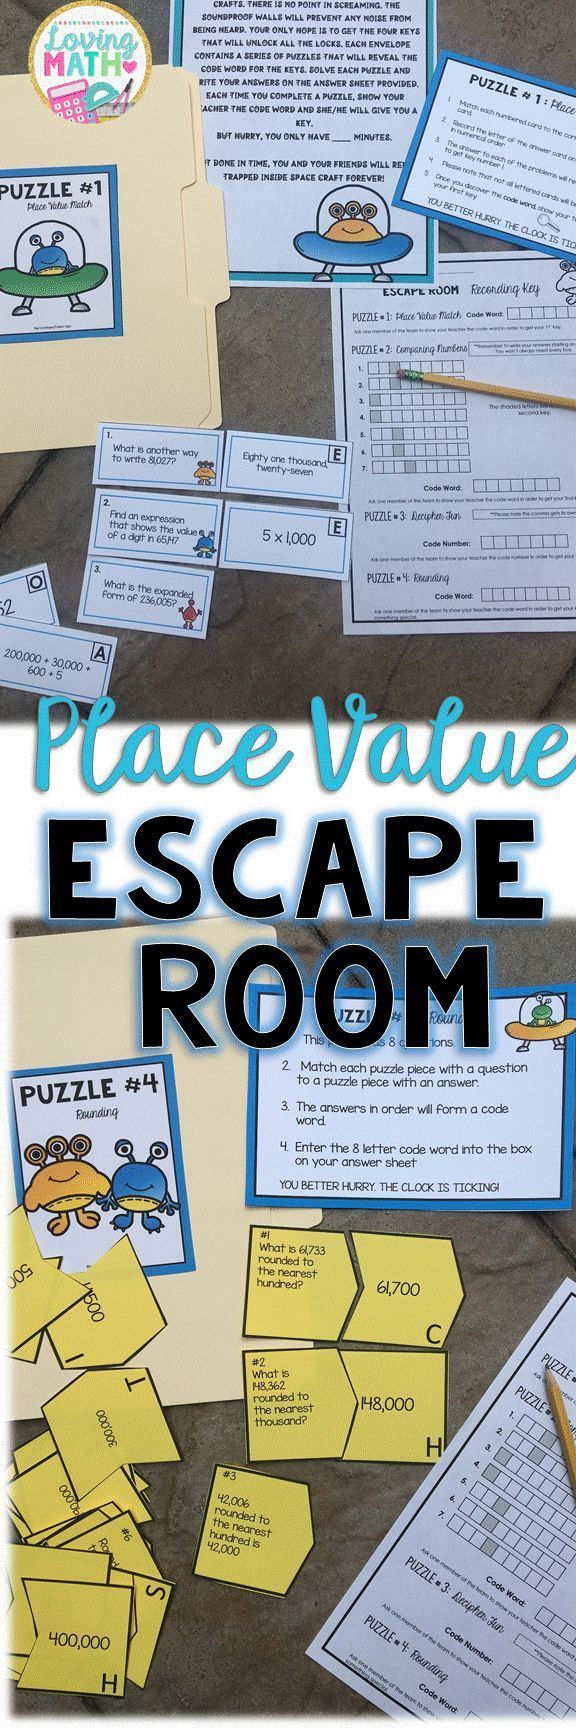 Place Value Escape Room - A Place Value Game | TpT Misc. Lessons ...